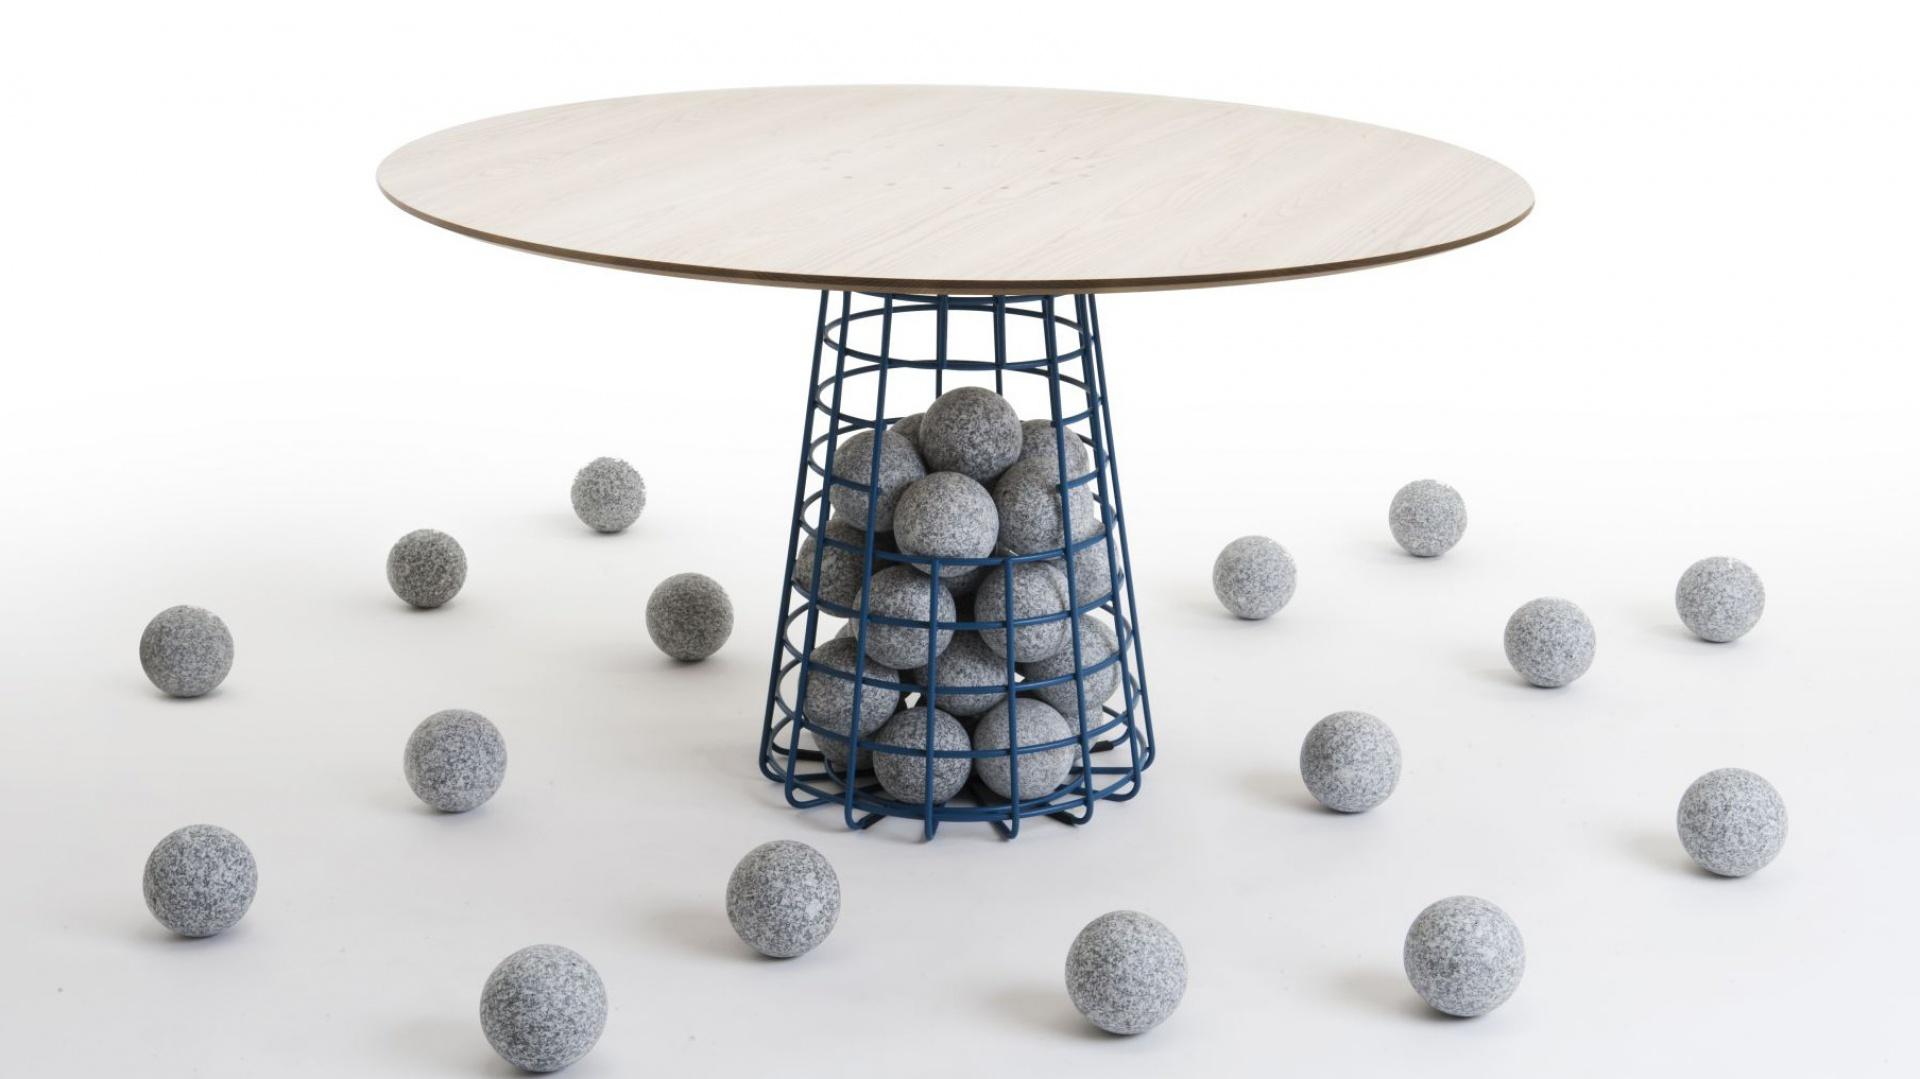 Pleciona noga stolika Gabion wypełniona jest szarymi kulkami. Fot. Benjamin Hubert.